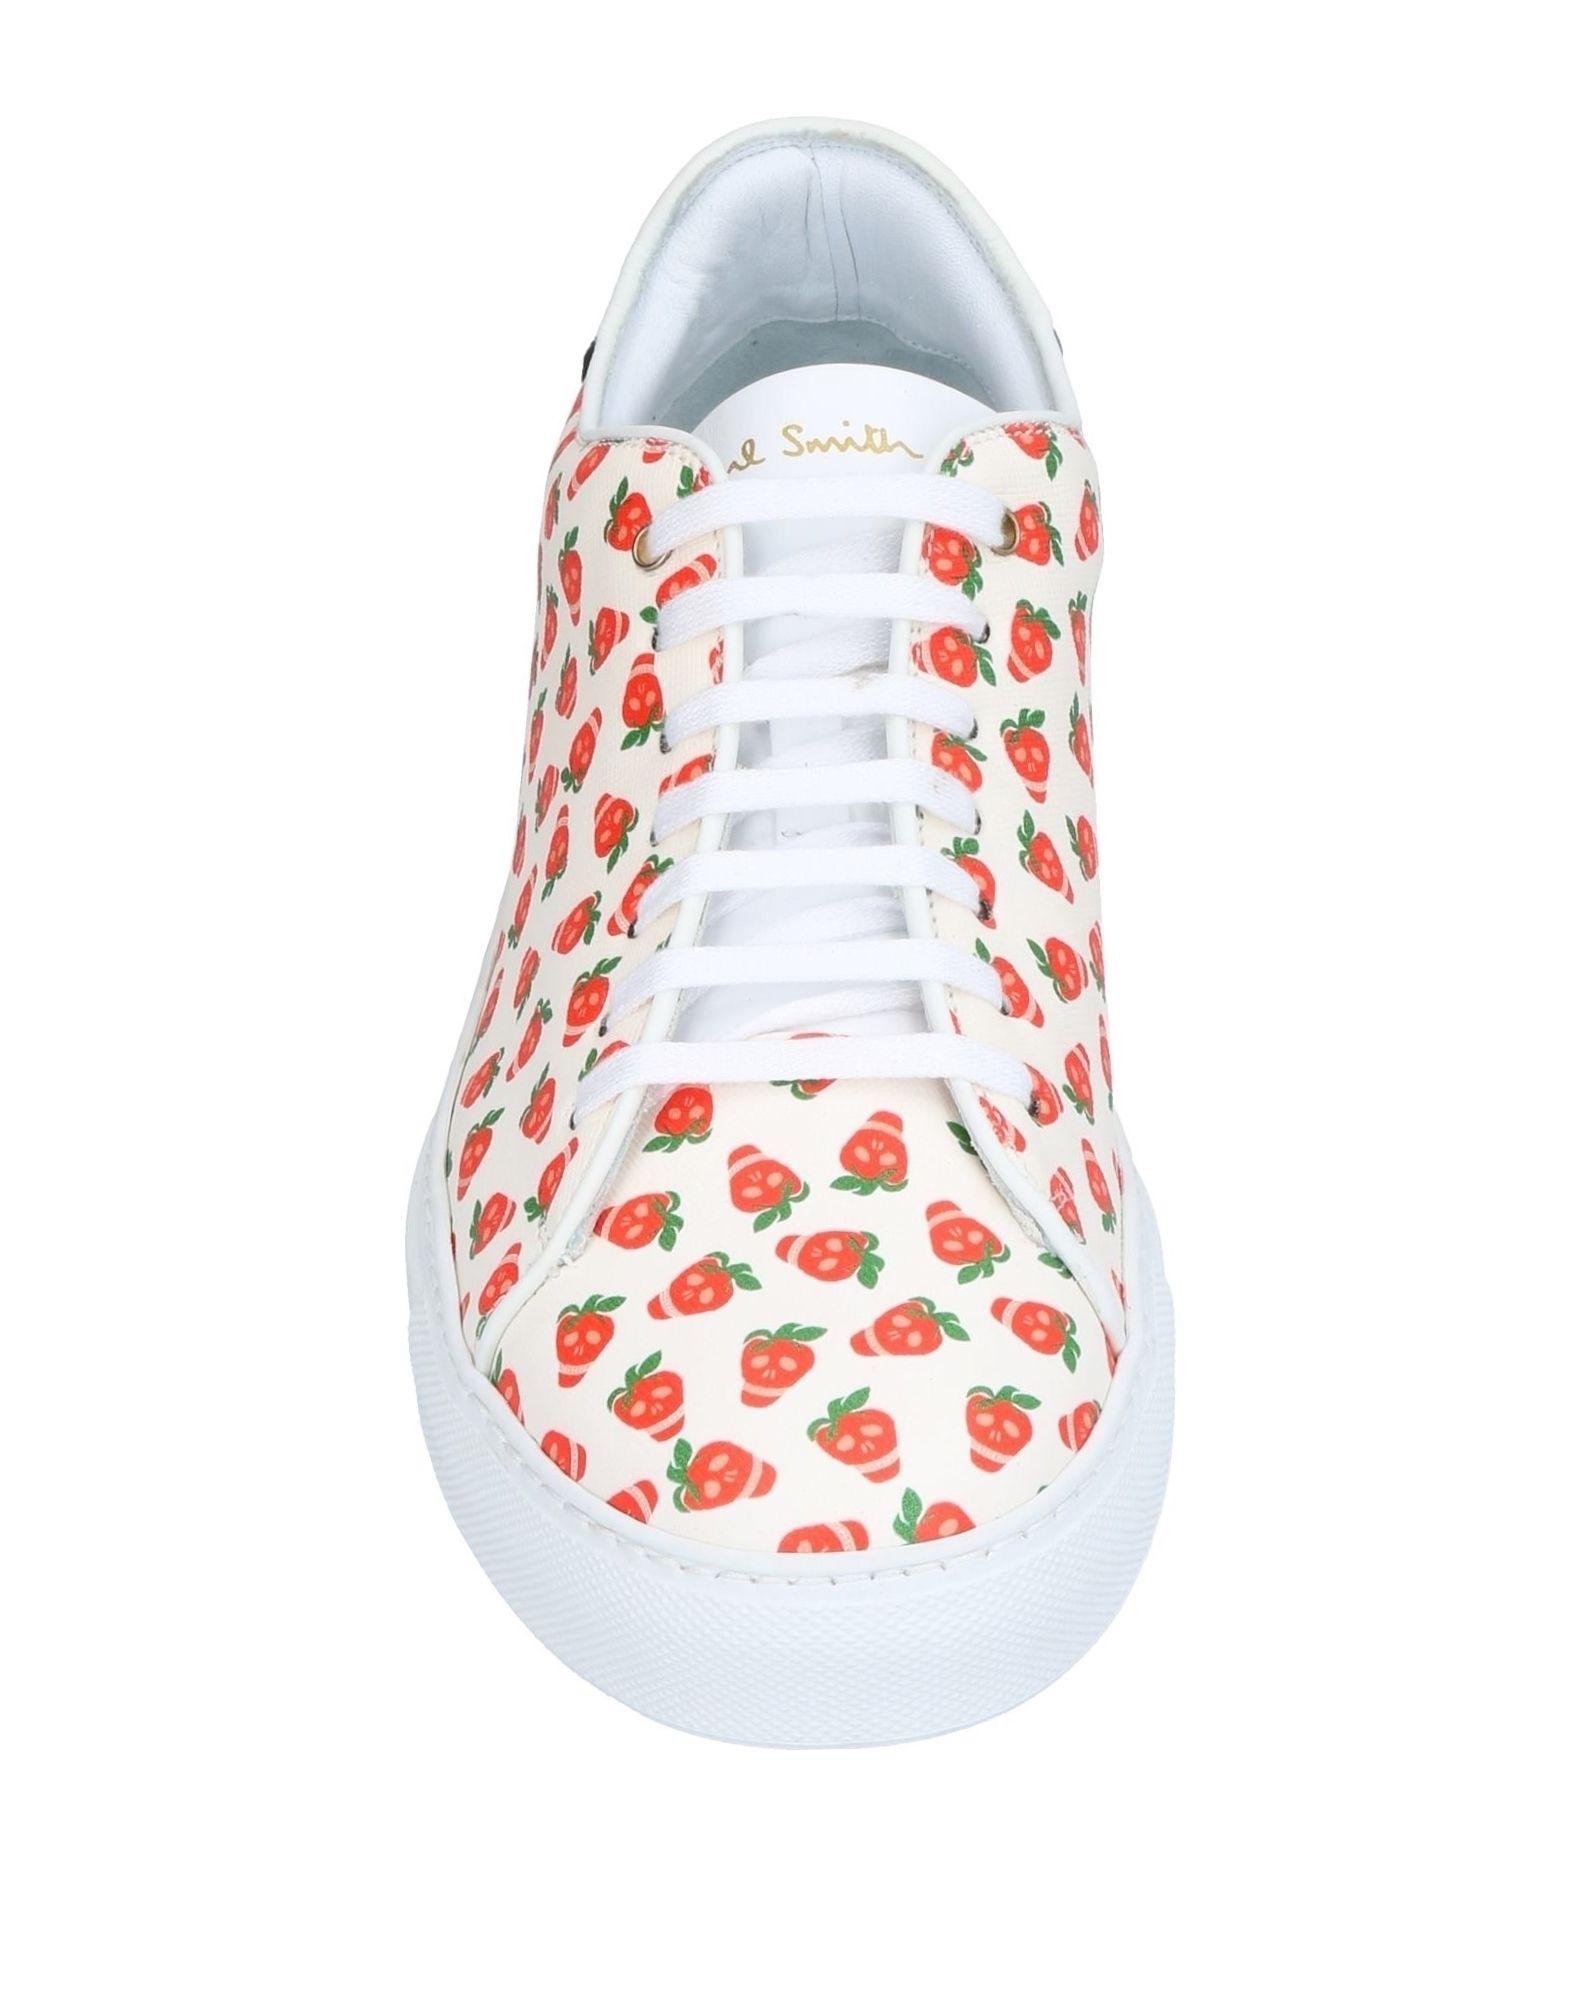 Paul Schuhe Smith Sneakers Herren  11397185RK Neue Schuhe Paul 45159f